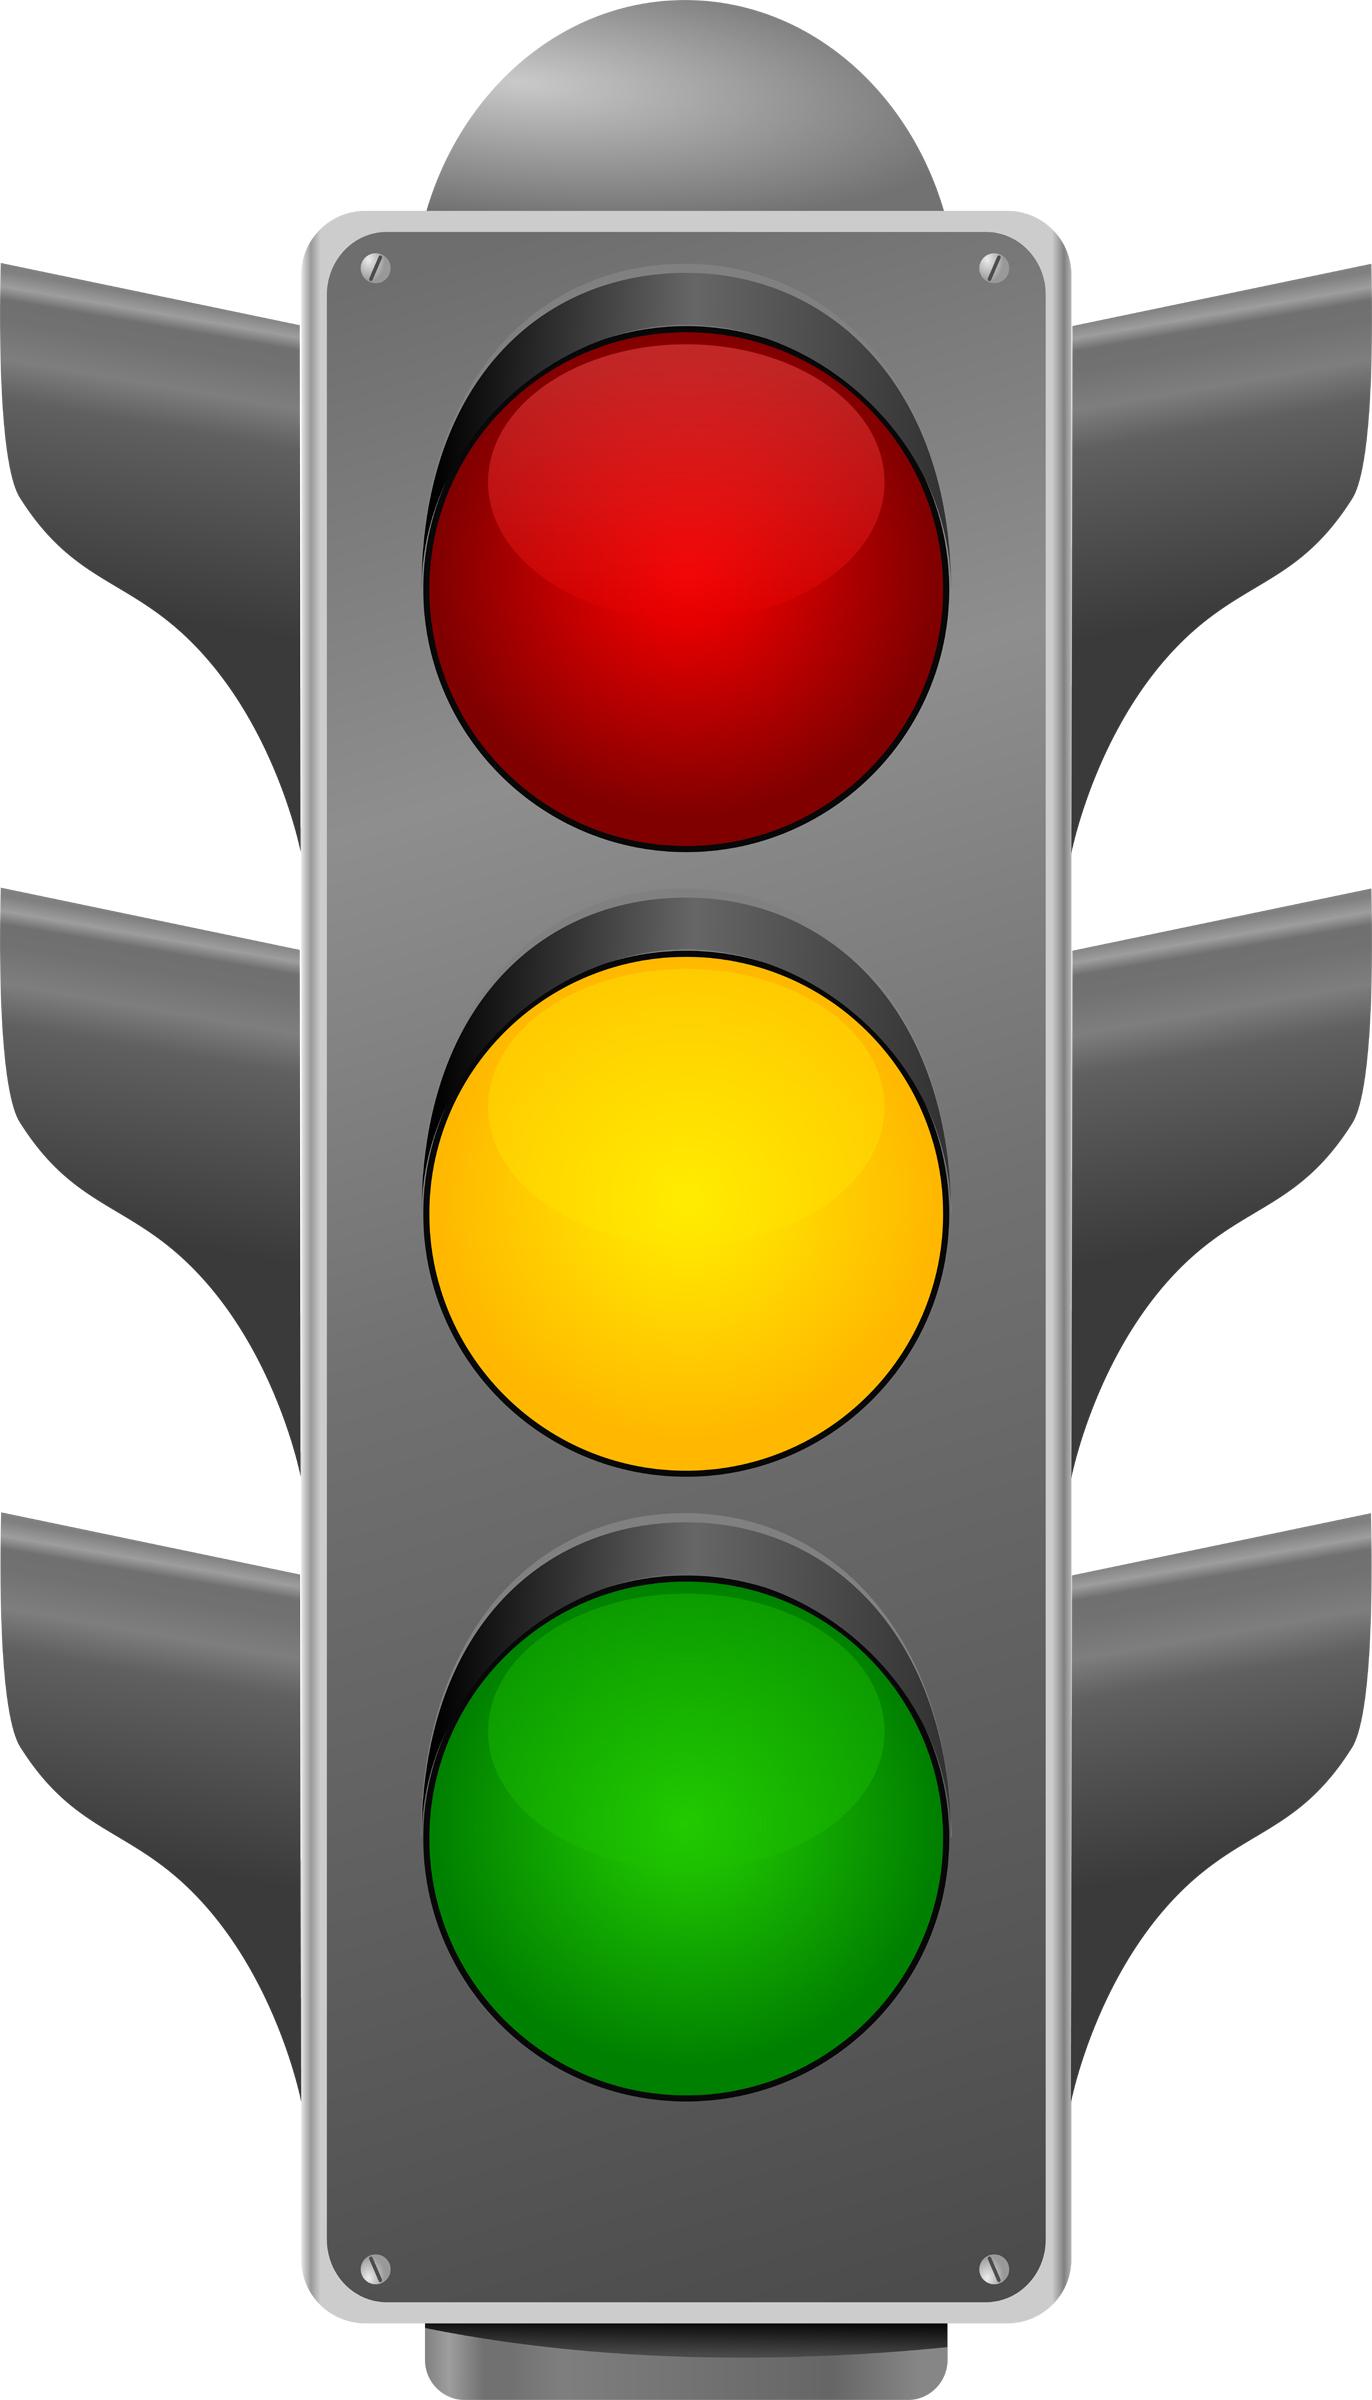 image 5731c73102012199e9025c347dde8f9d resolution 1372x2400 yellow rh objectshowfanonpedia wikia com spotlight clip art images stoplight clipart for powerpoint slides